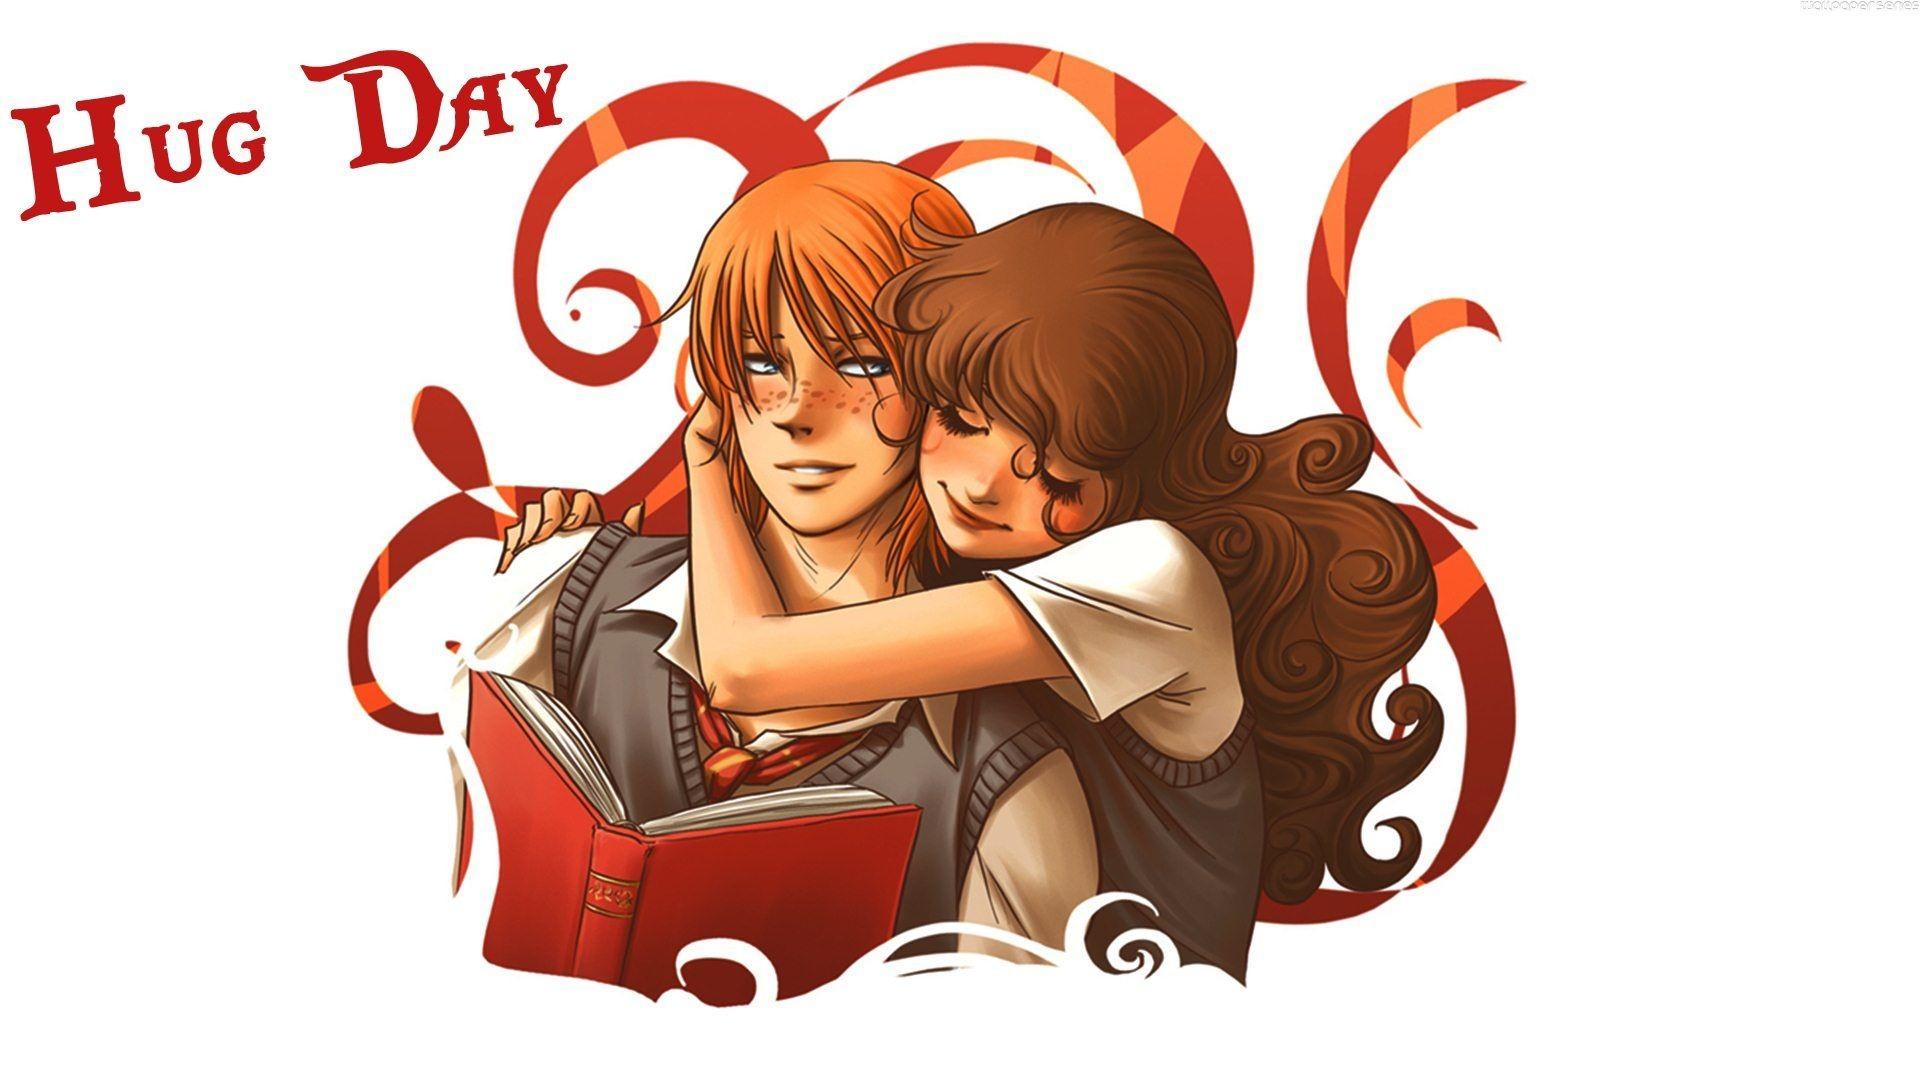 Hug Day Wallpapers for Mobile & Desktop15 – CGfrog – Daily Design .